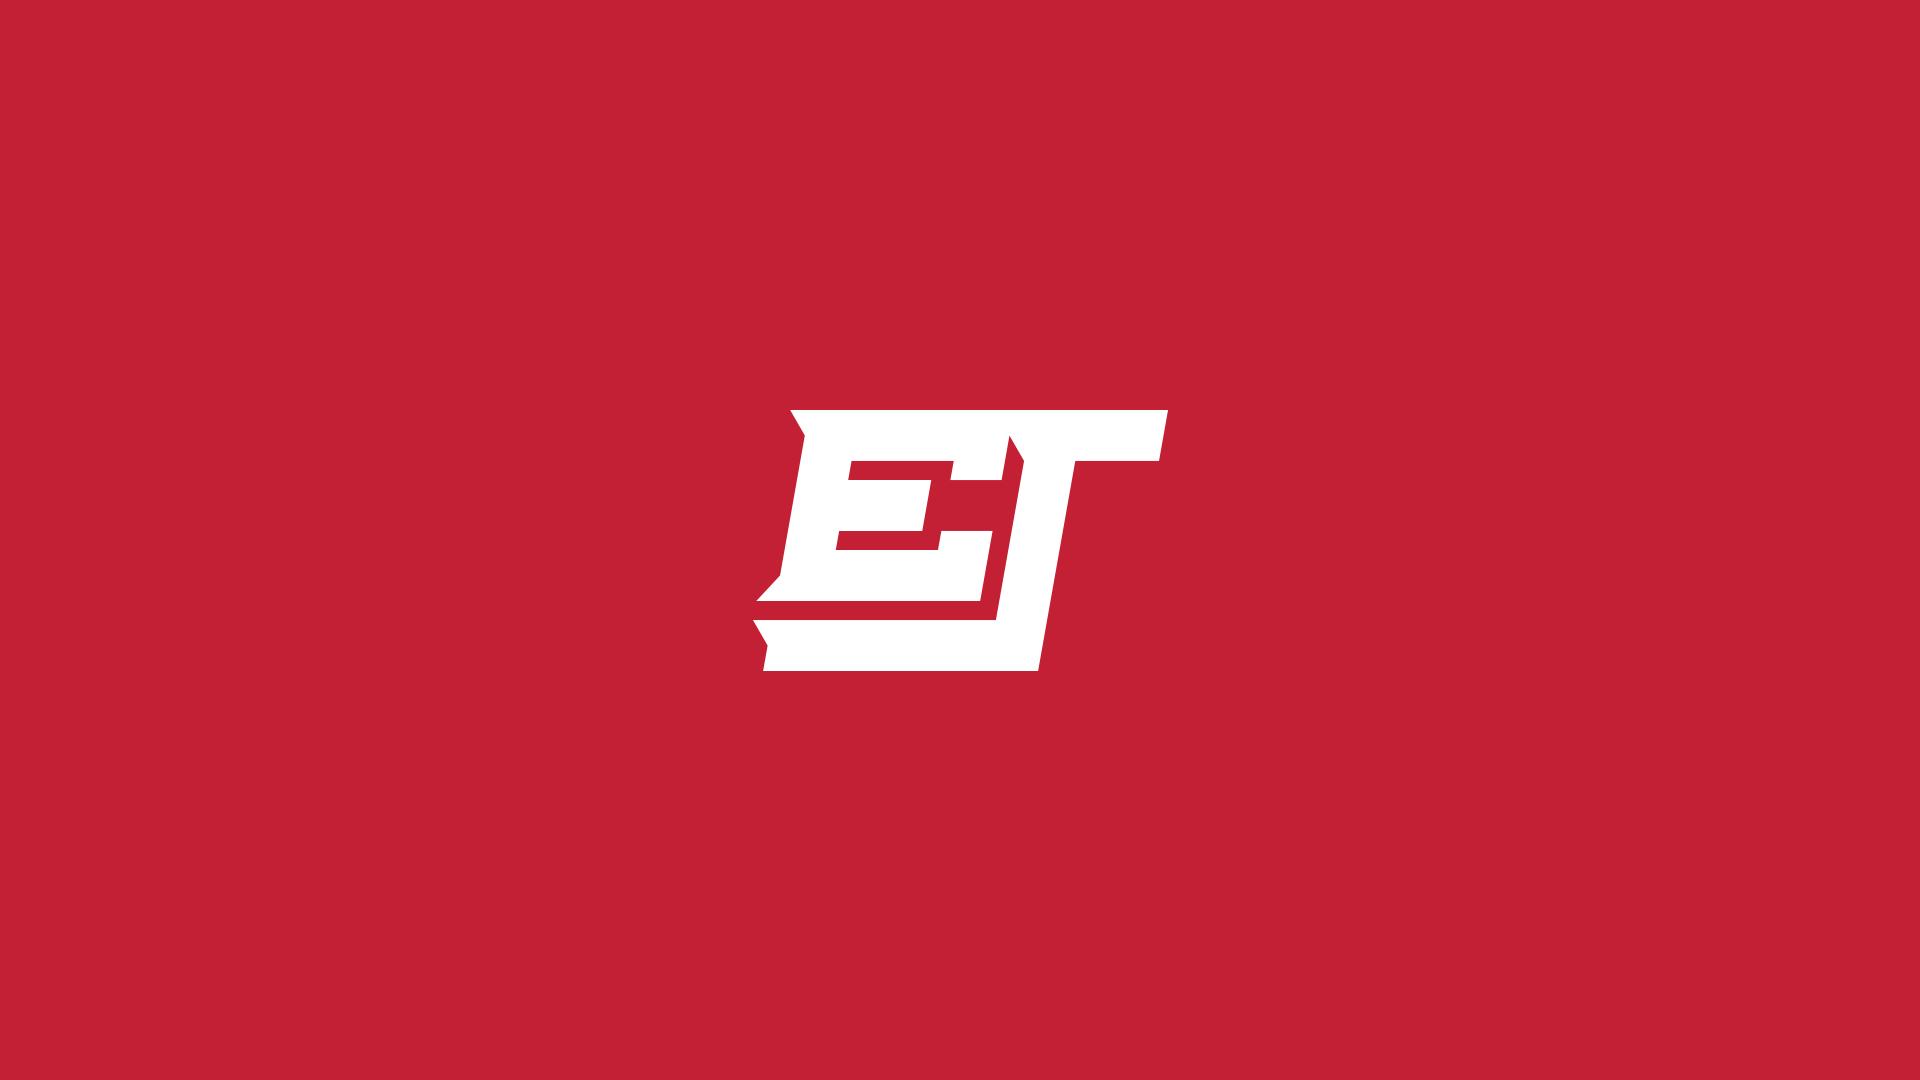 ErikJones-Screens-1080-SCREEn1